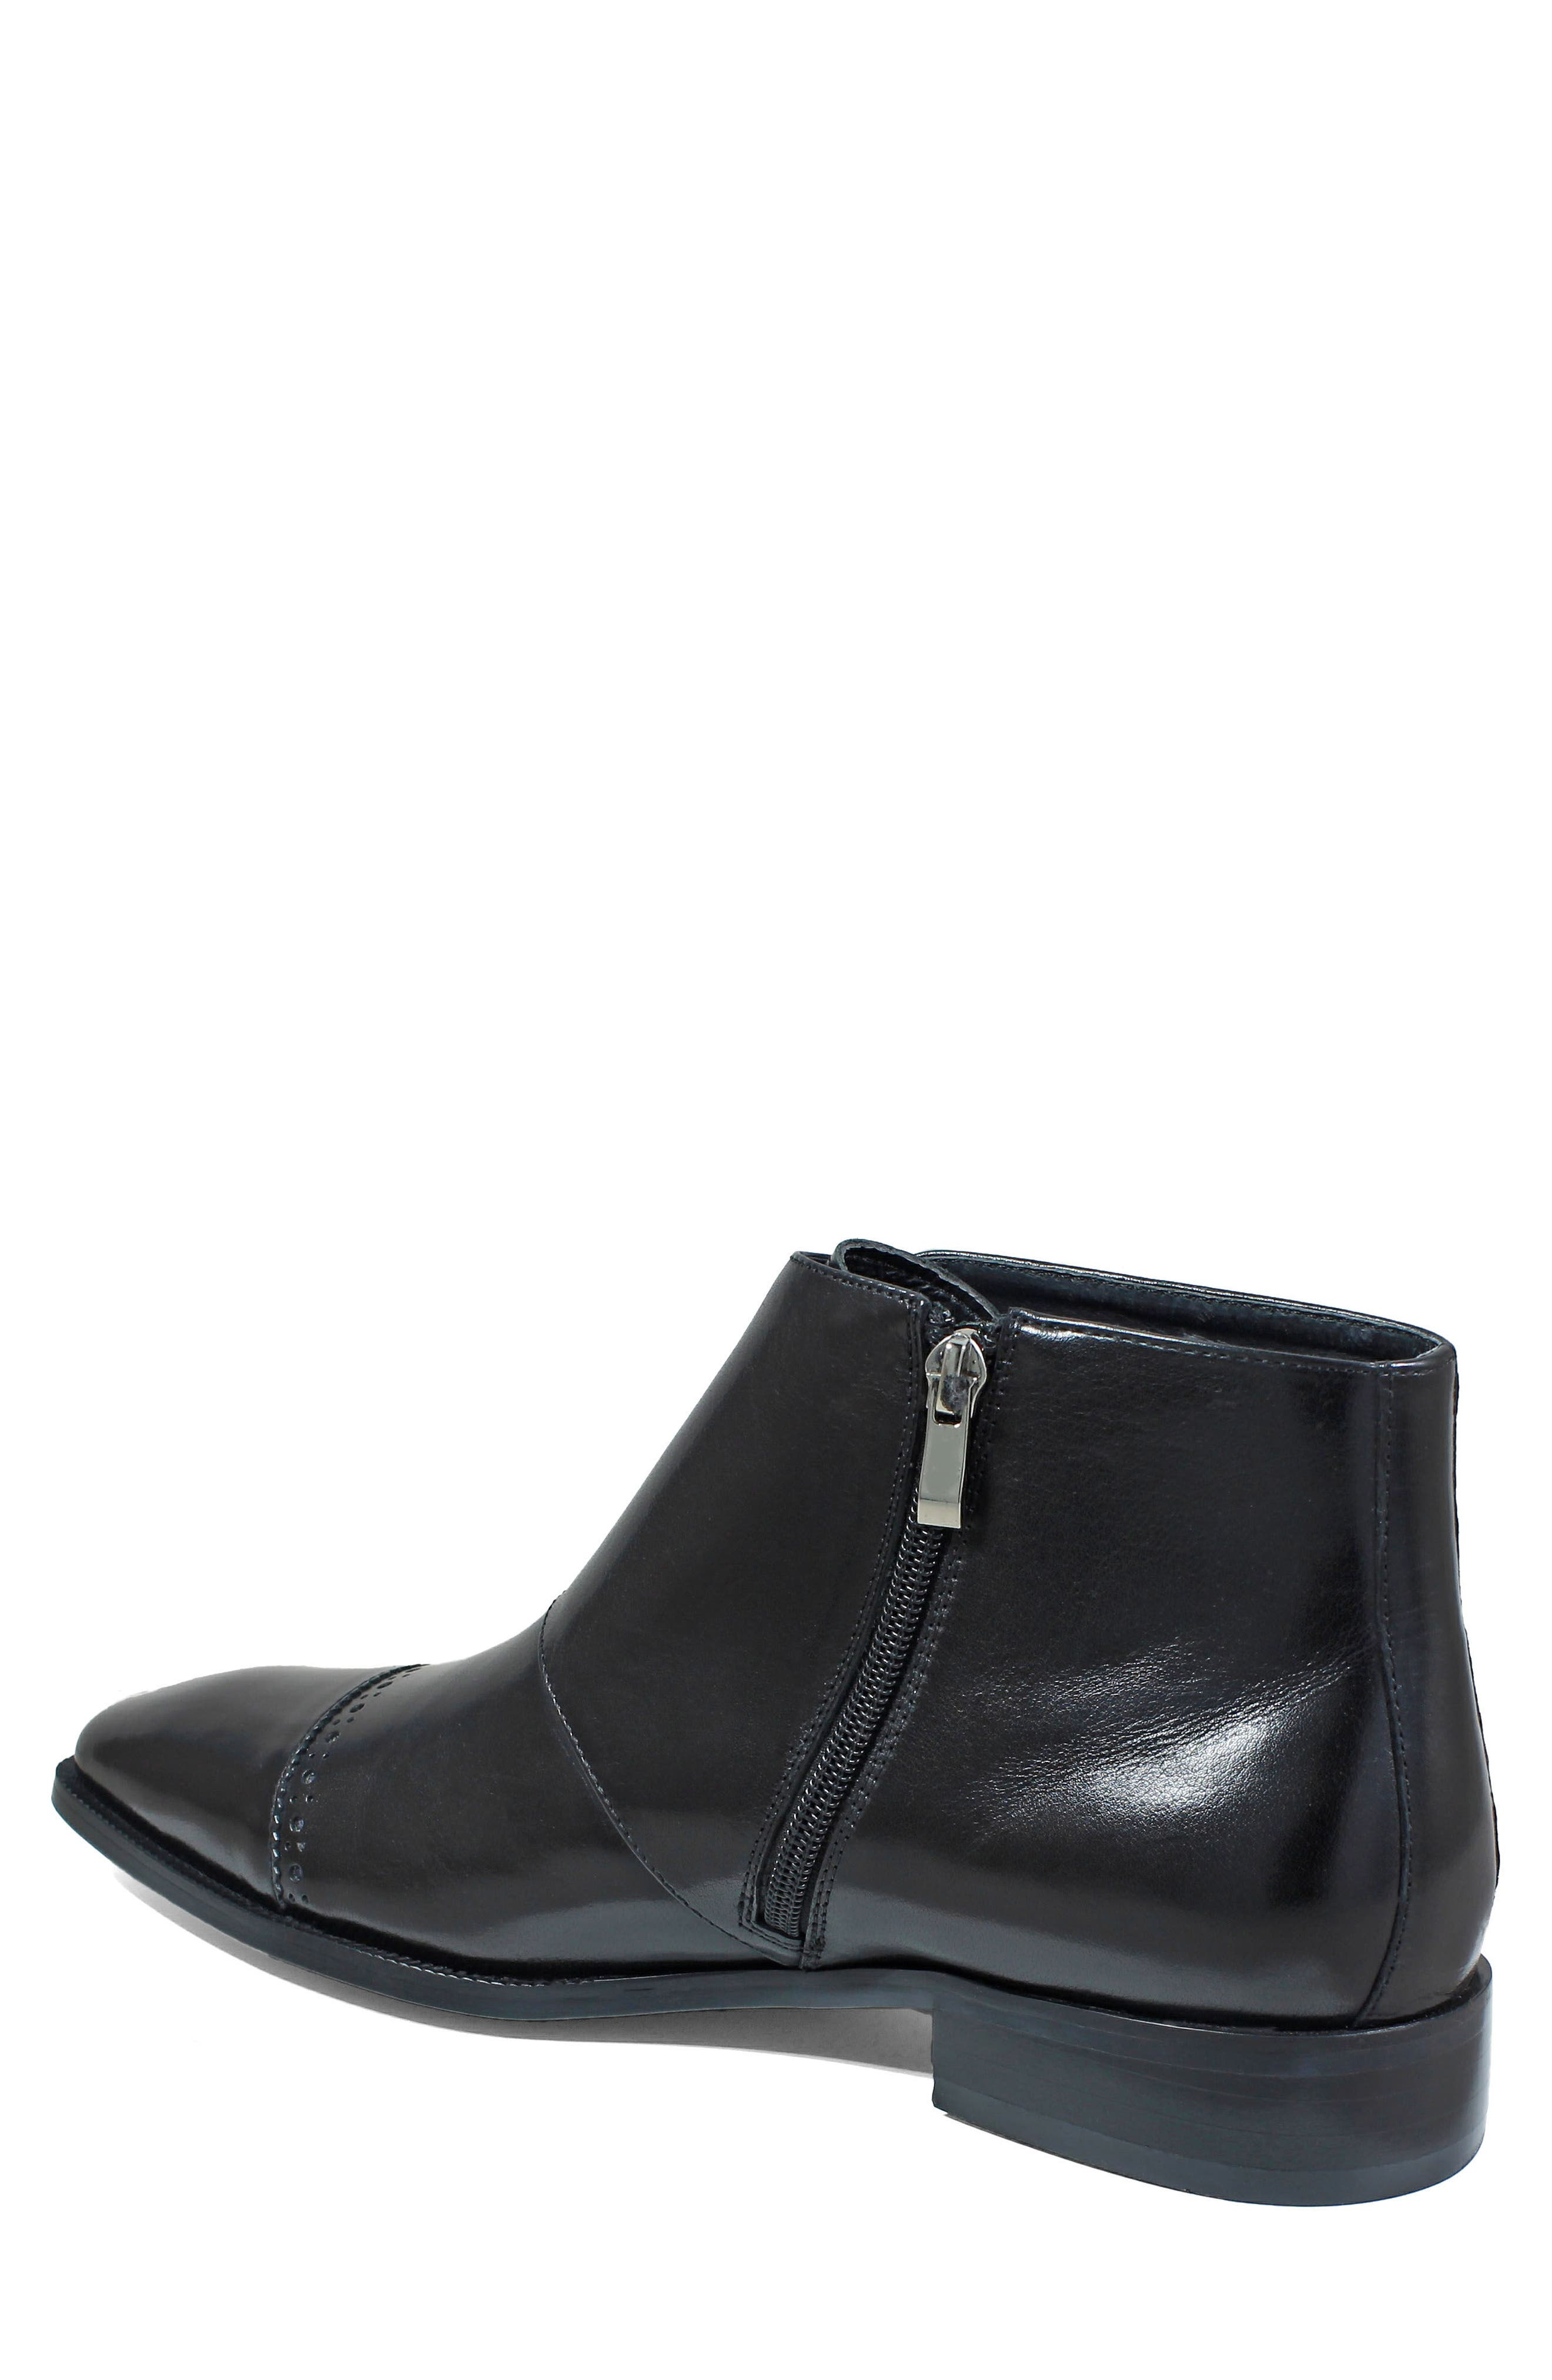 Kason Double Monk Strap Boot,                             Alternate thumbnail 2, color,                             001